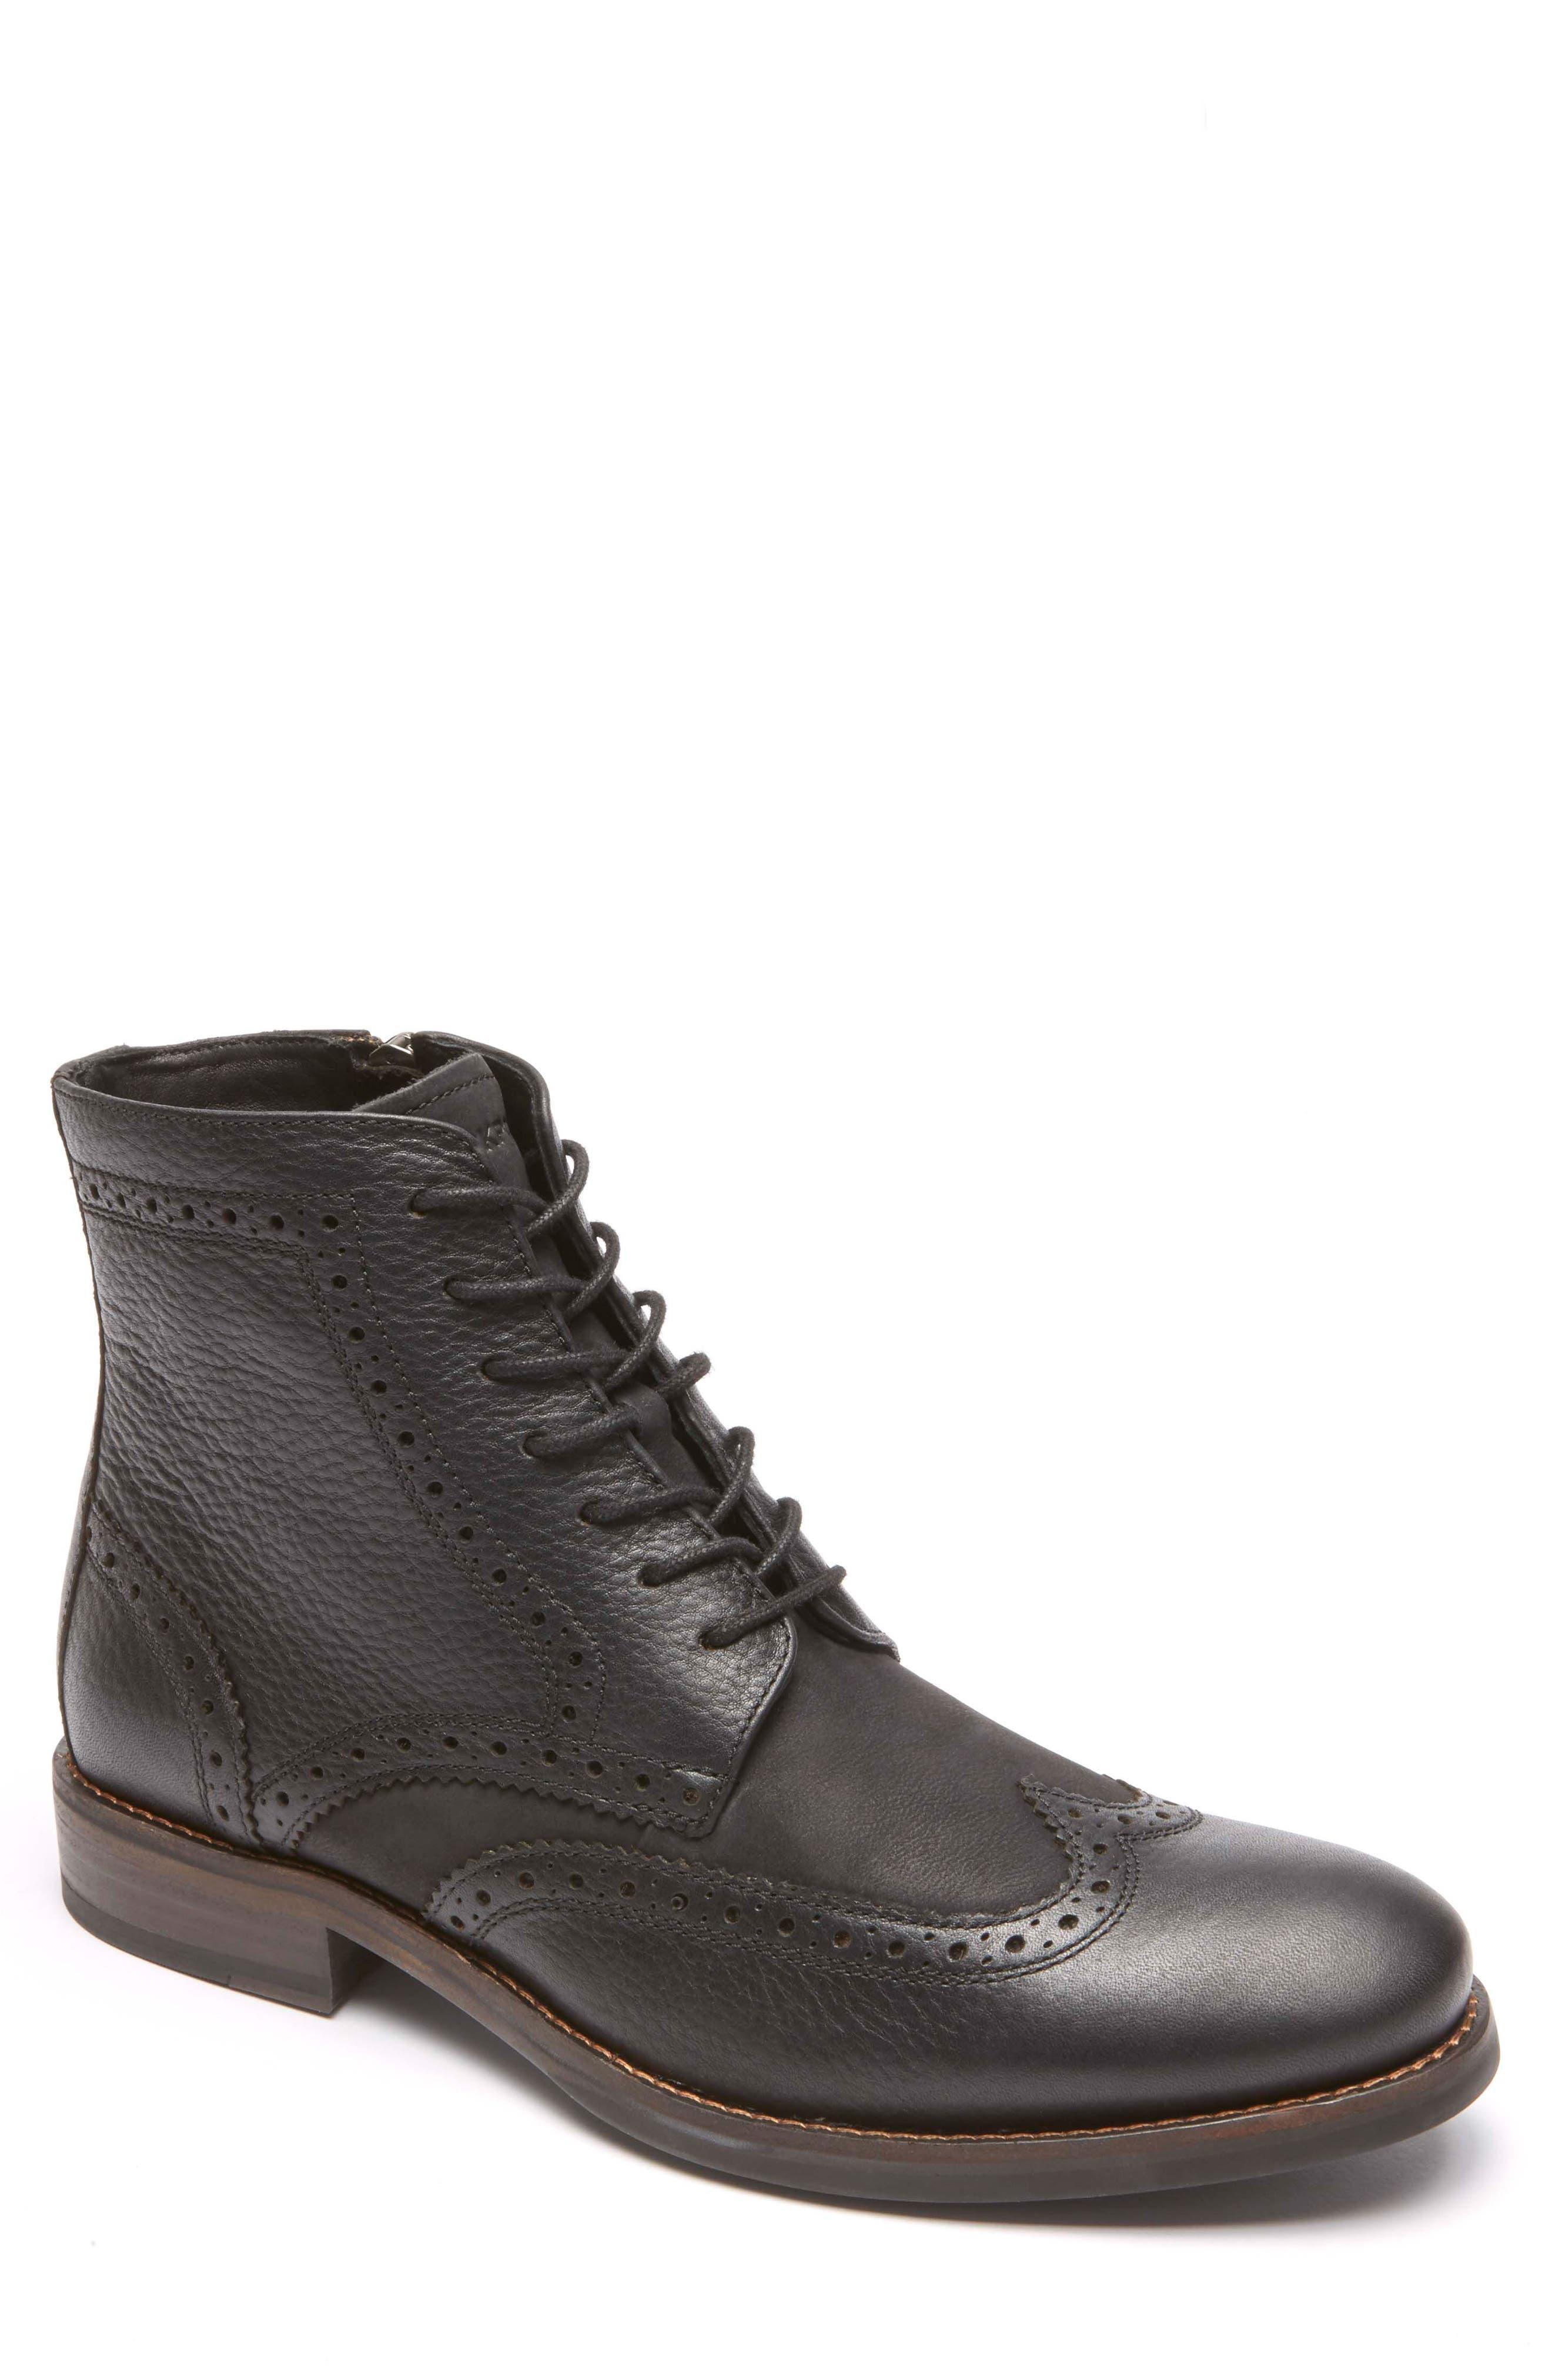 Wyat Wingtip Boot,                         Main,                         color, 002